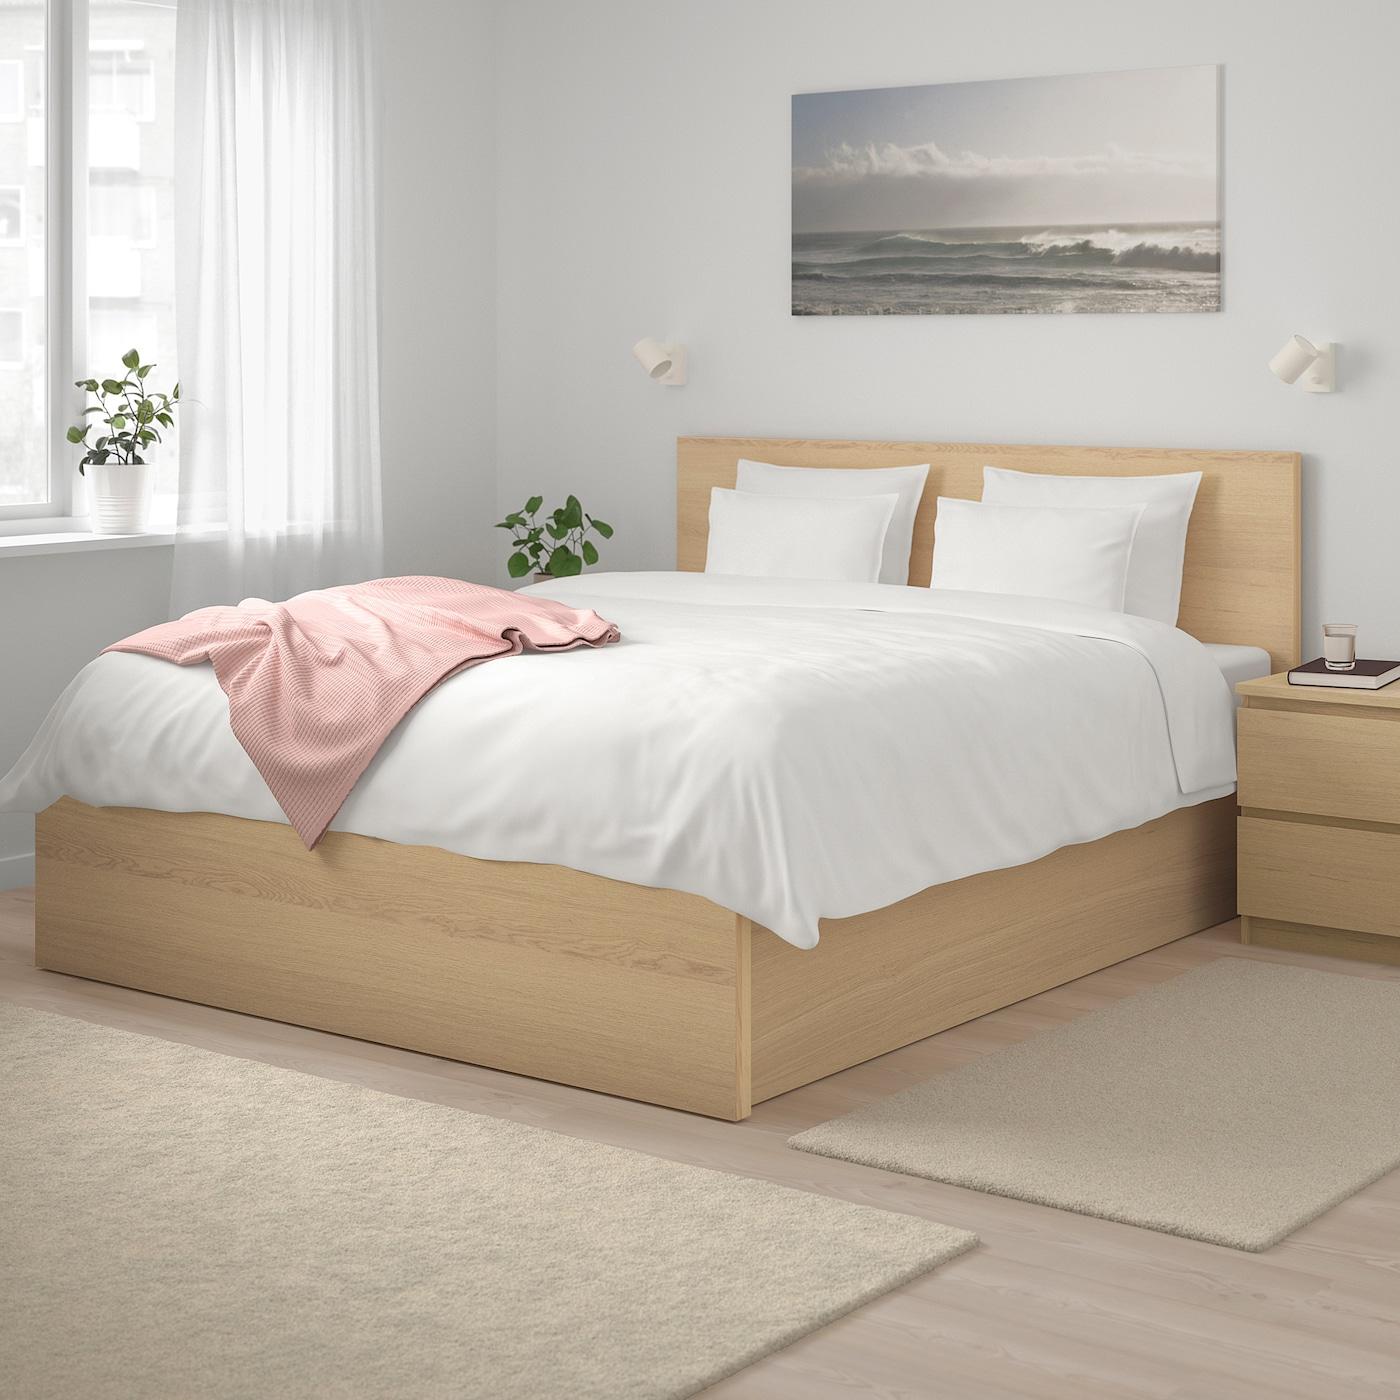 Malm Ottoman Bed White Stained Oak Veneer 160x200 Cm Ikea